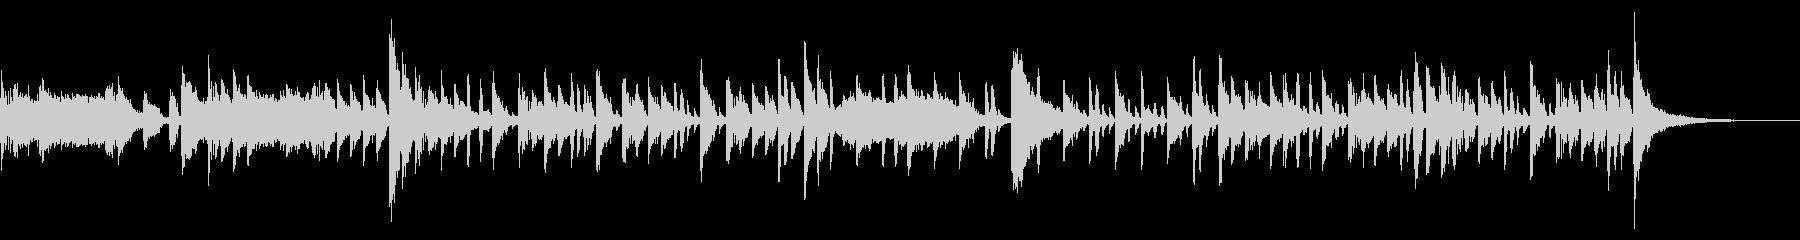 LUNARTIC TECHNO-POPの未再生の波形